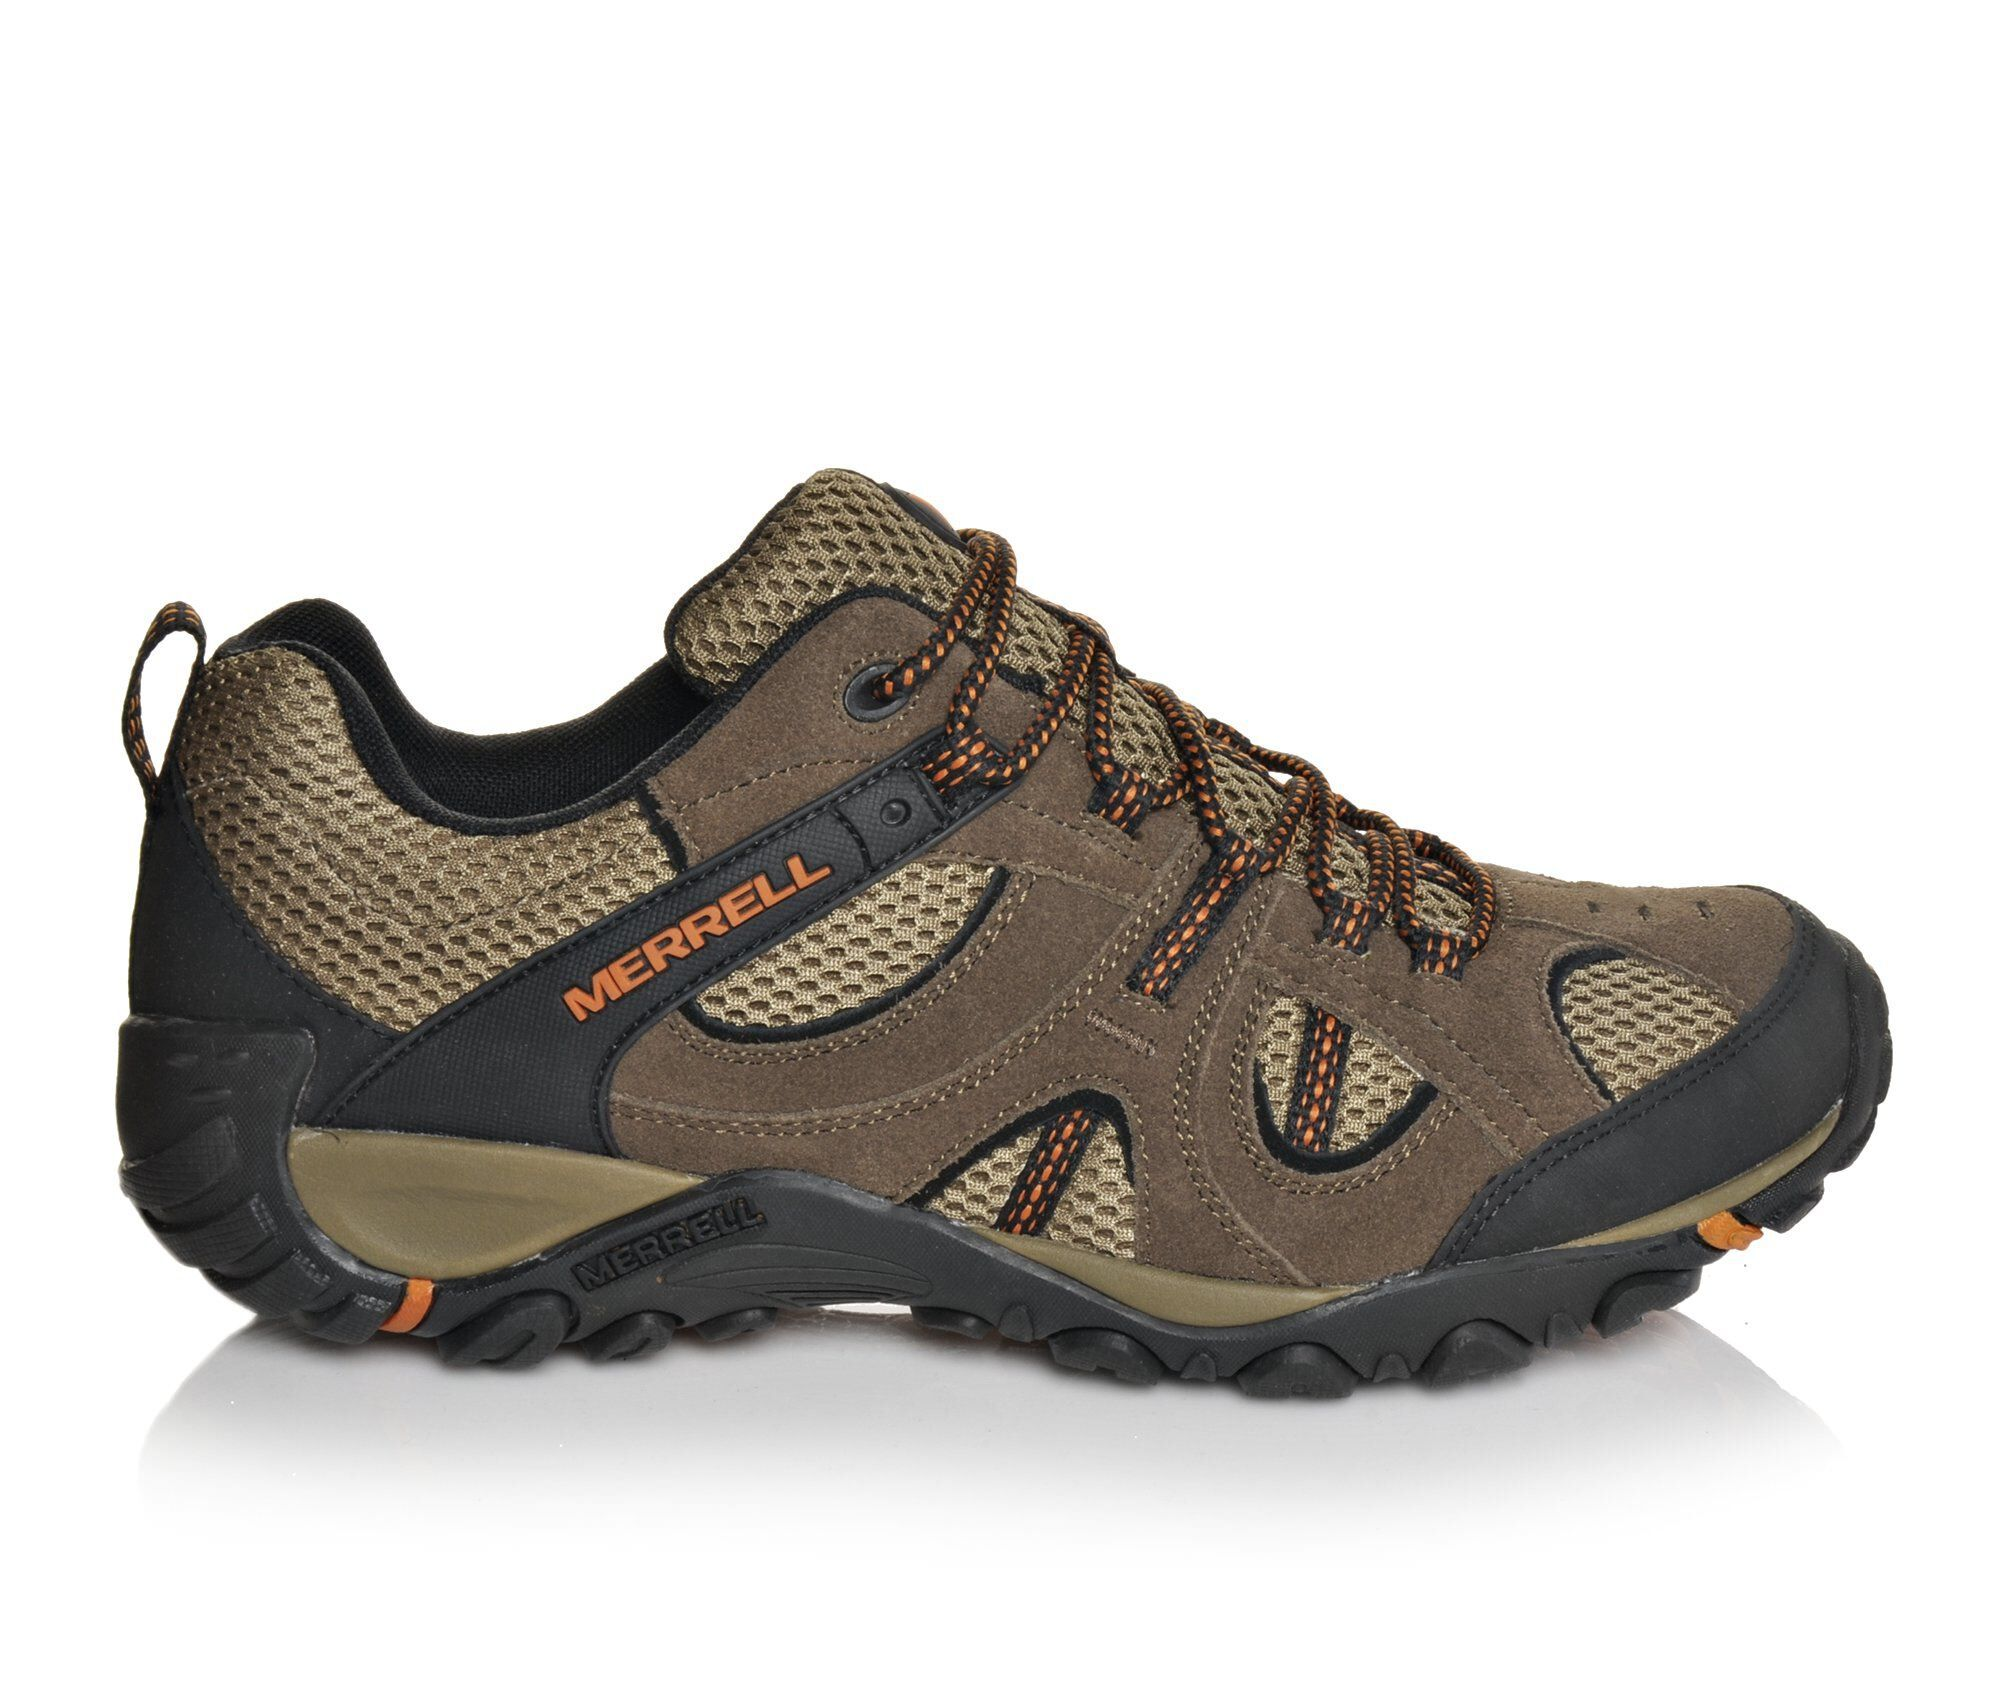 Men's Merrell Yokota Trail Ventilator Hiking Boots Stone/Orange